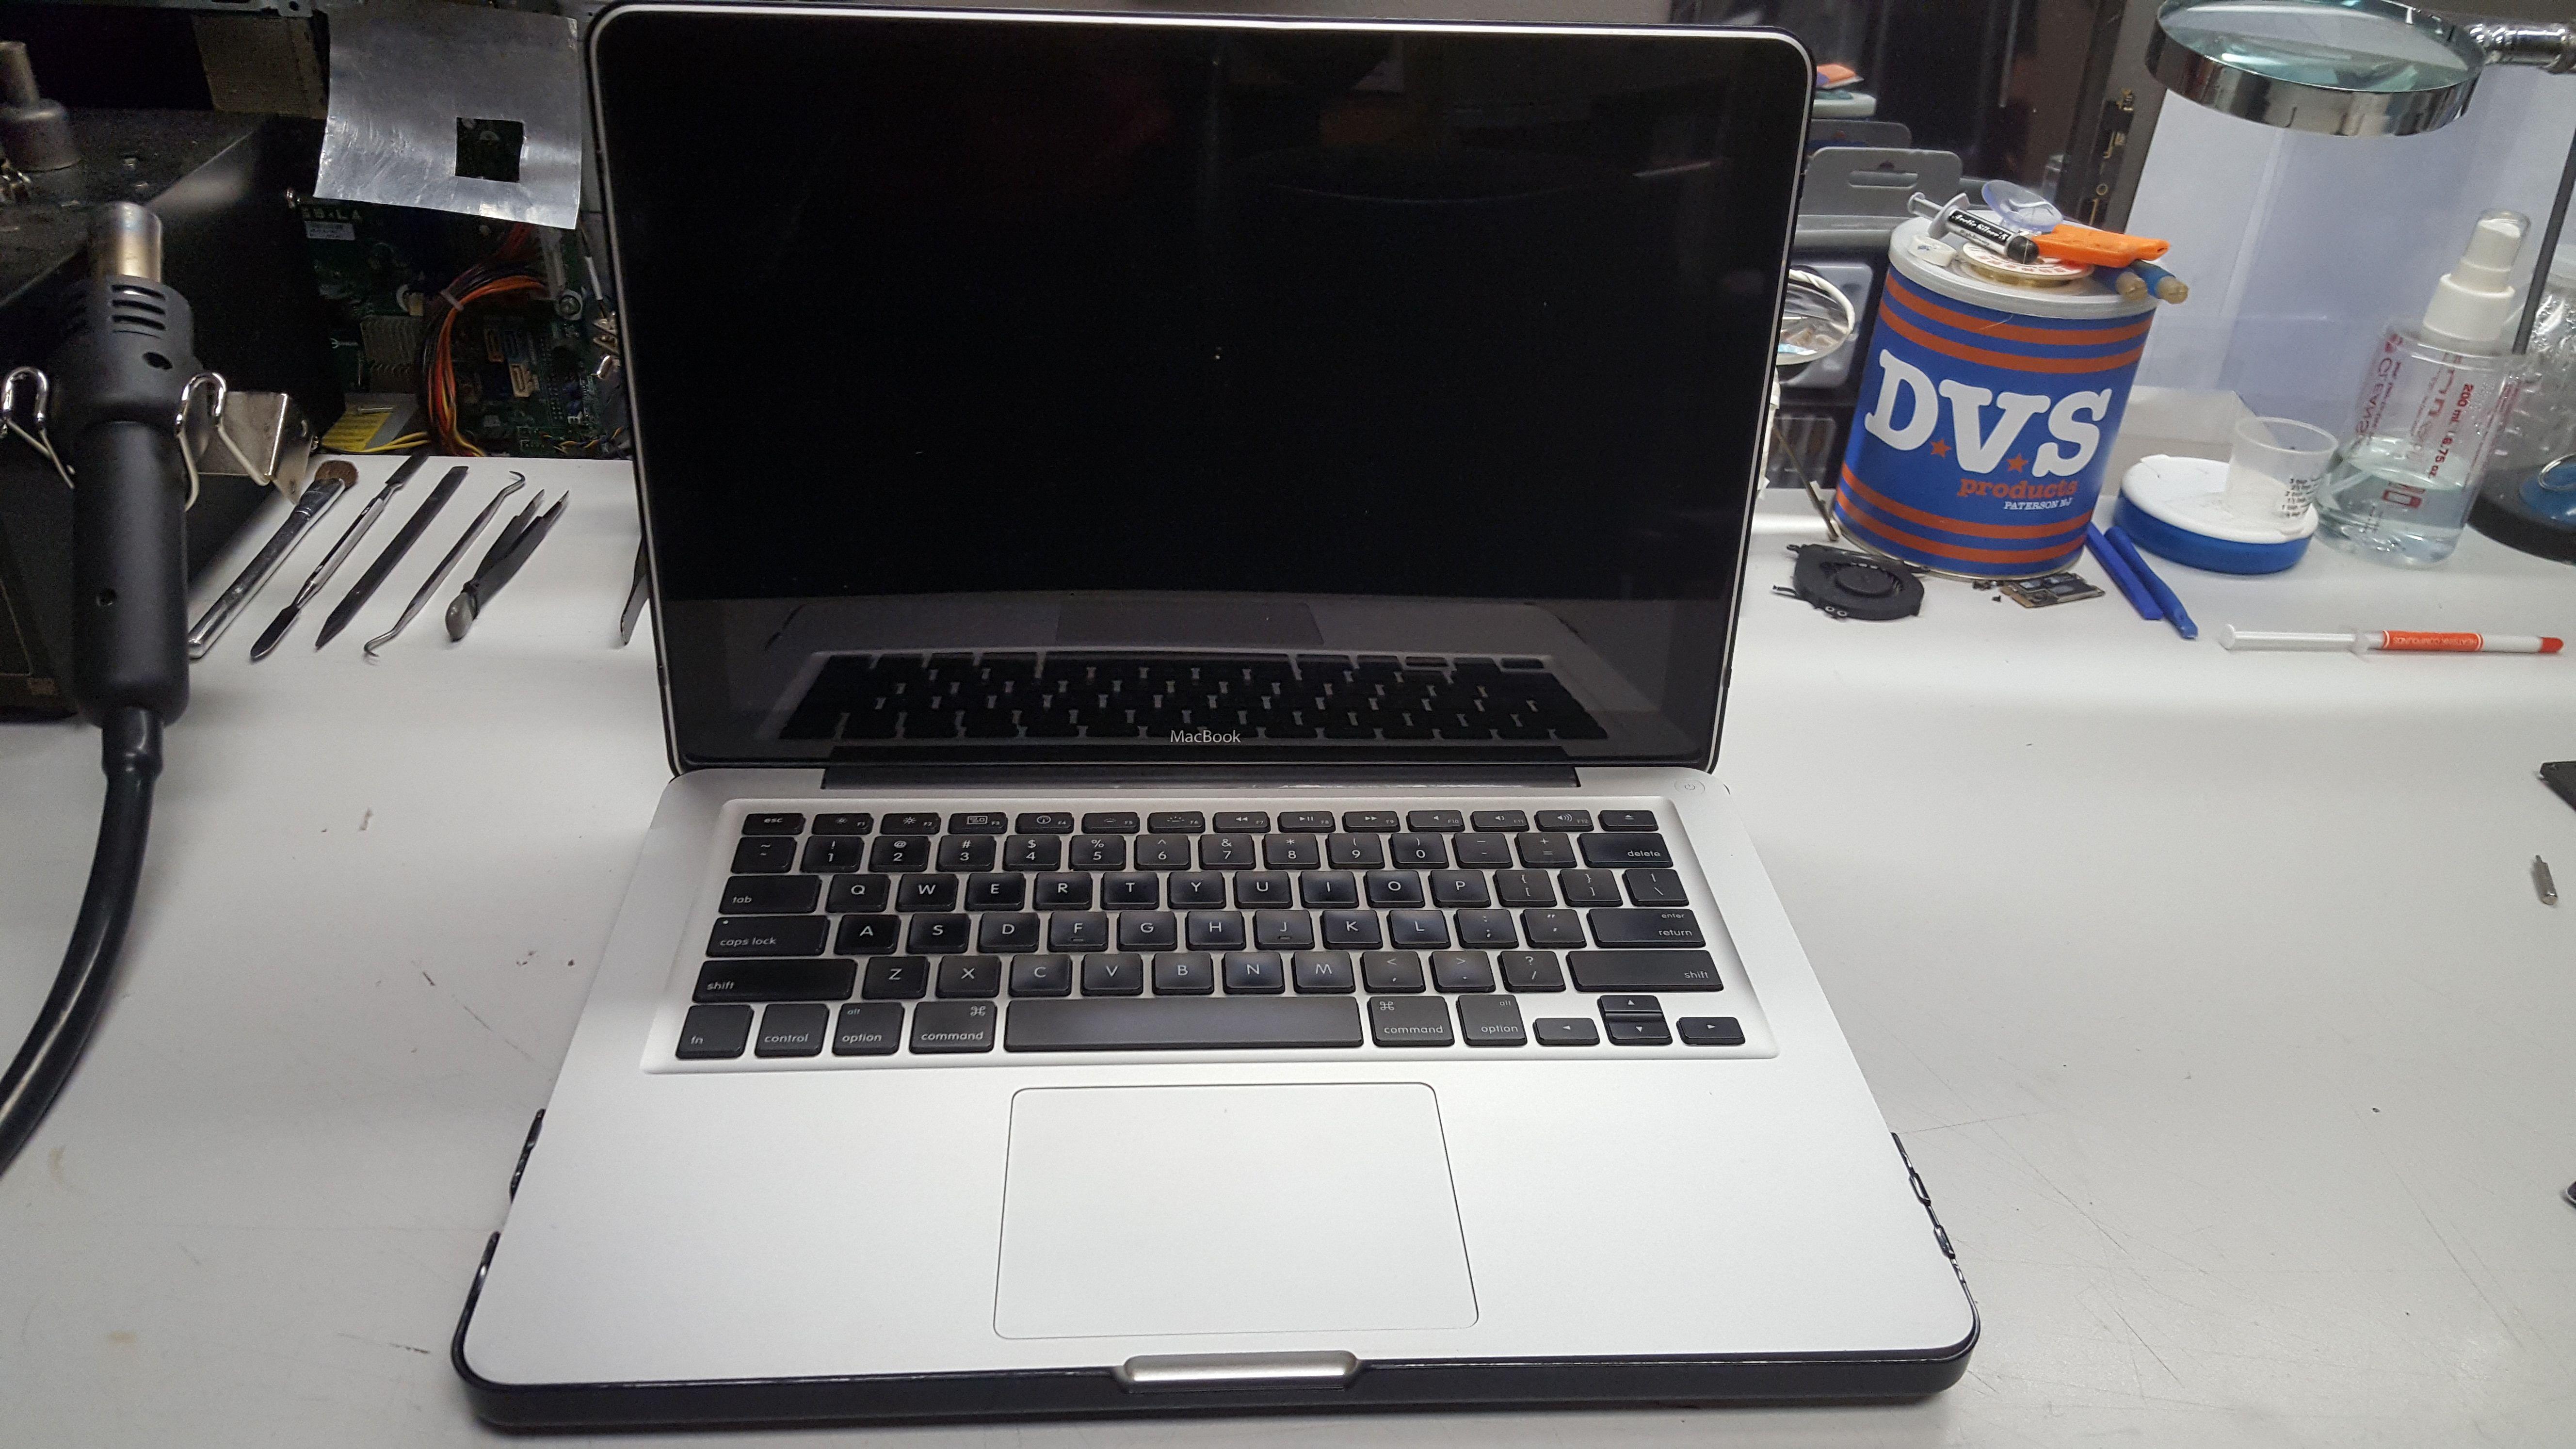 Macbook Pro 13 A1278 Core 2 Duo 2 4ghz 4gb Ram 500gb Hd Etsy Macbook Macbook Pro Macbook Pro For Sale